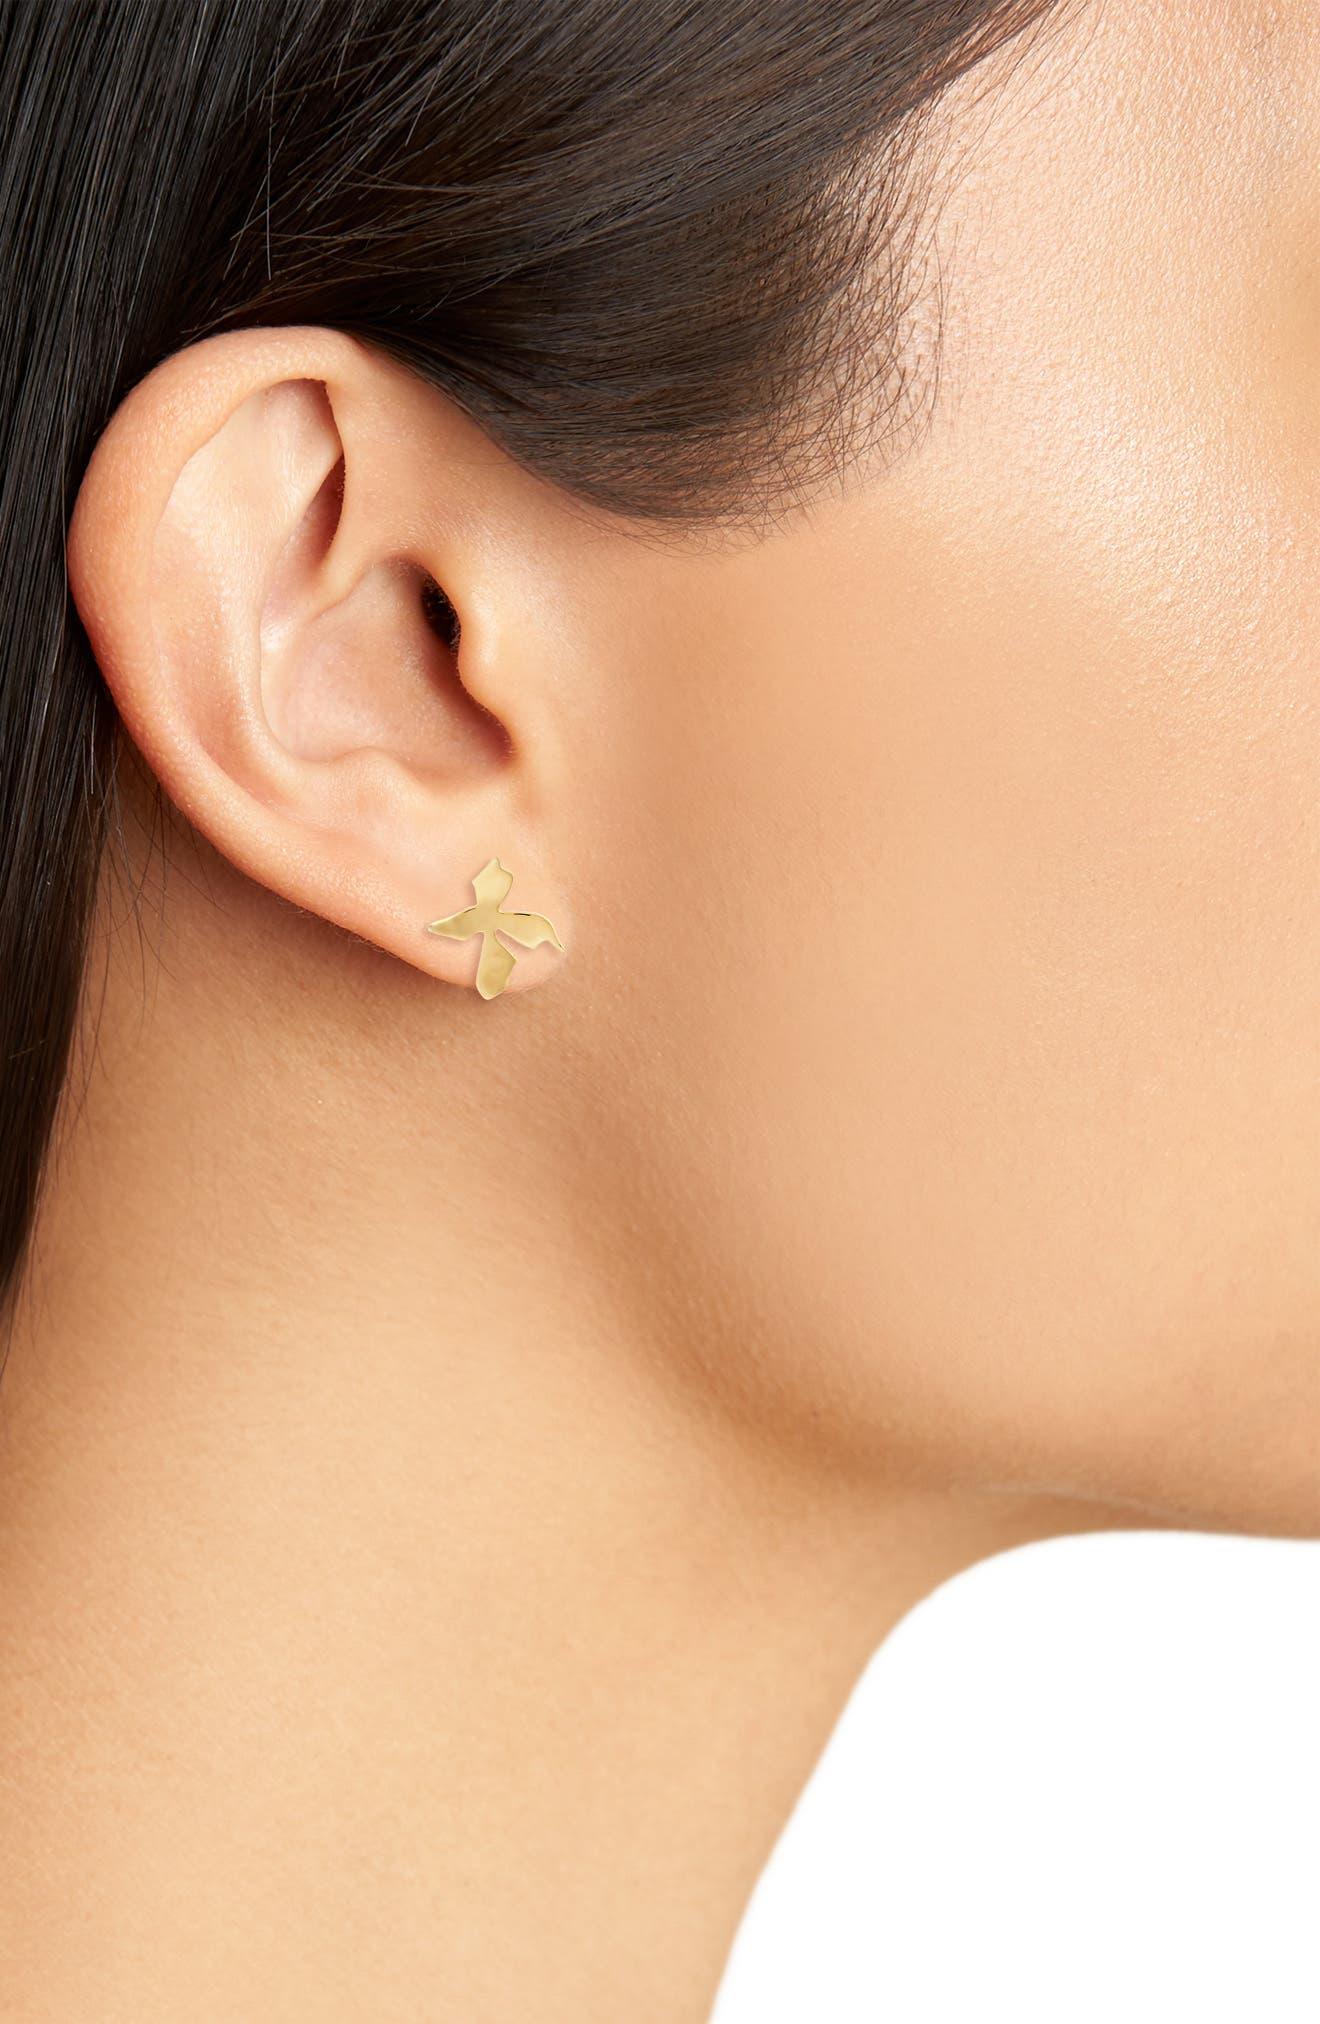 Small Stud Earrings,                             Alternate thumbnail 2, color,                             14K Gold